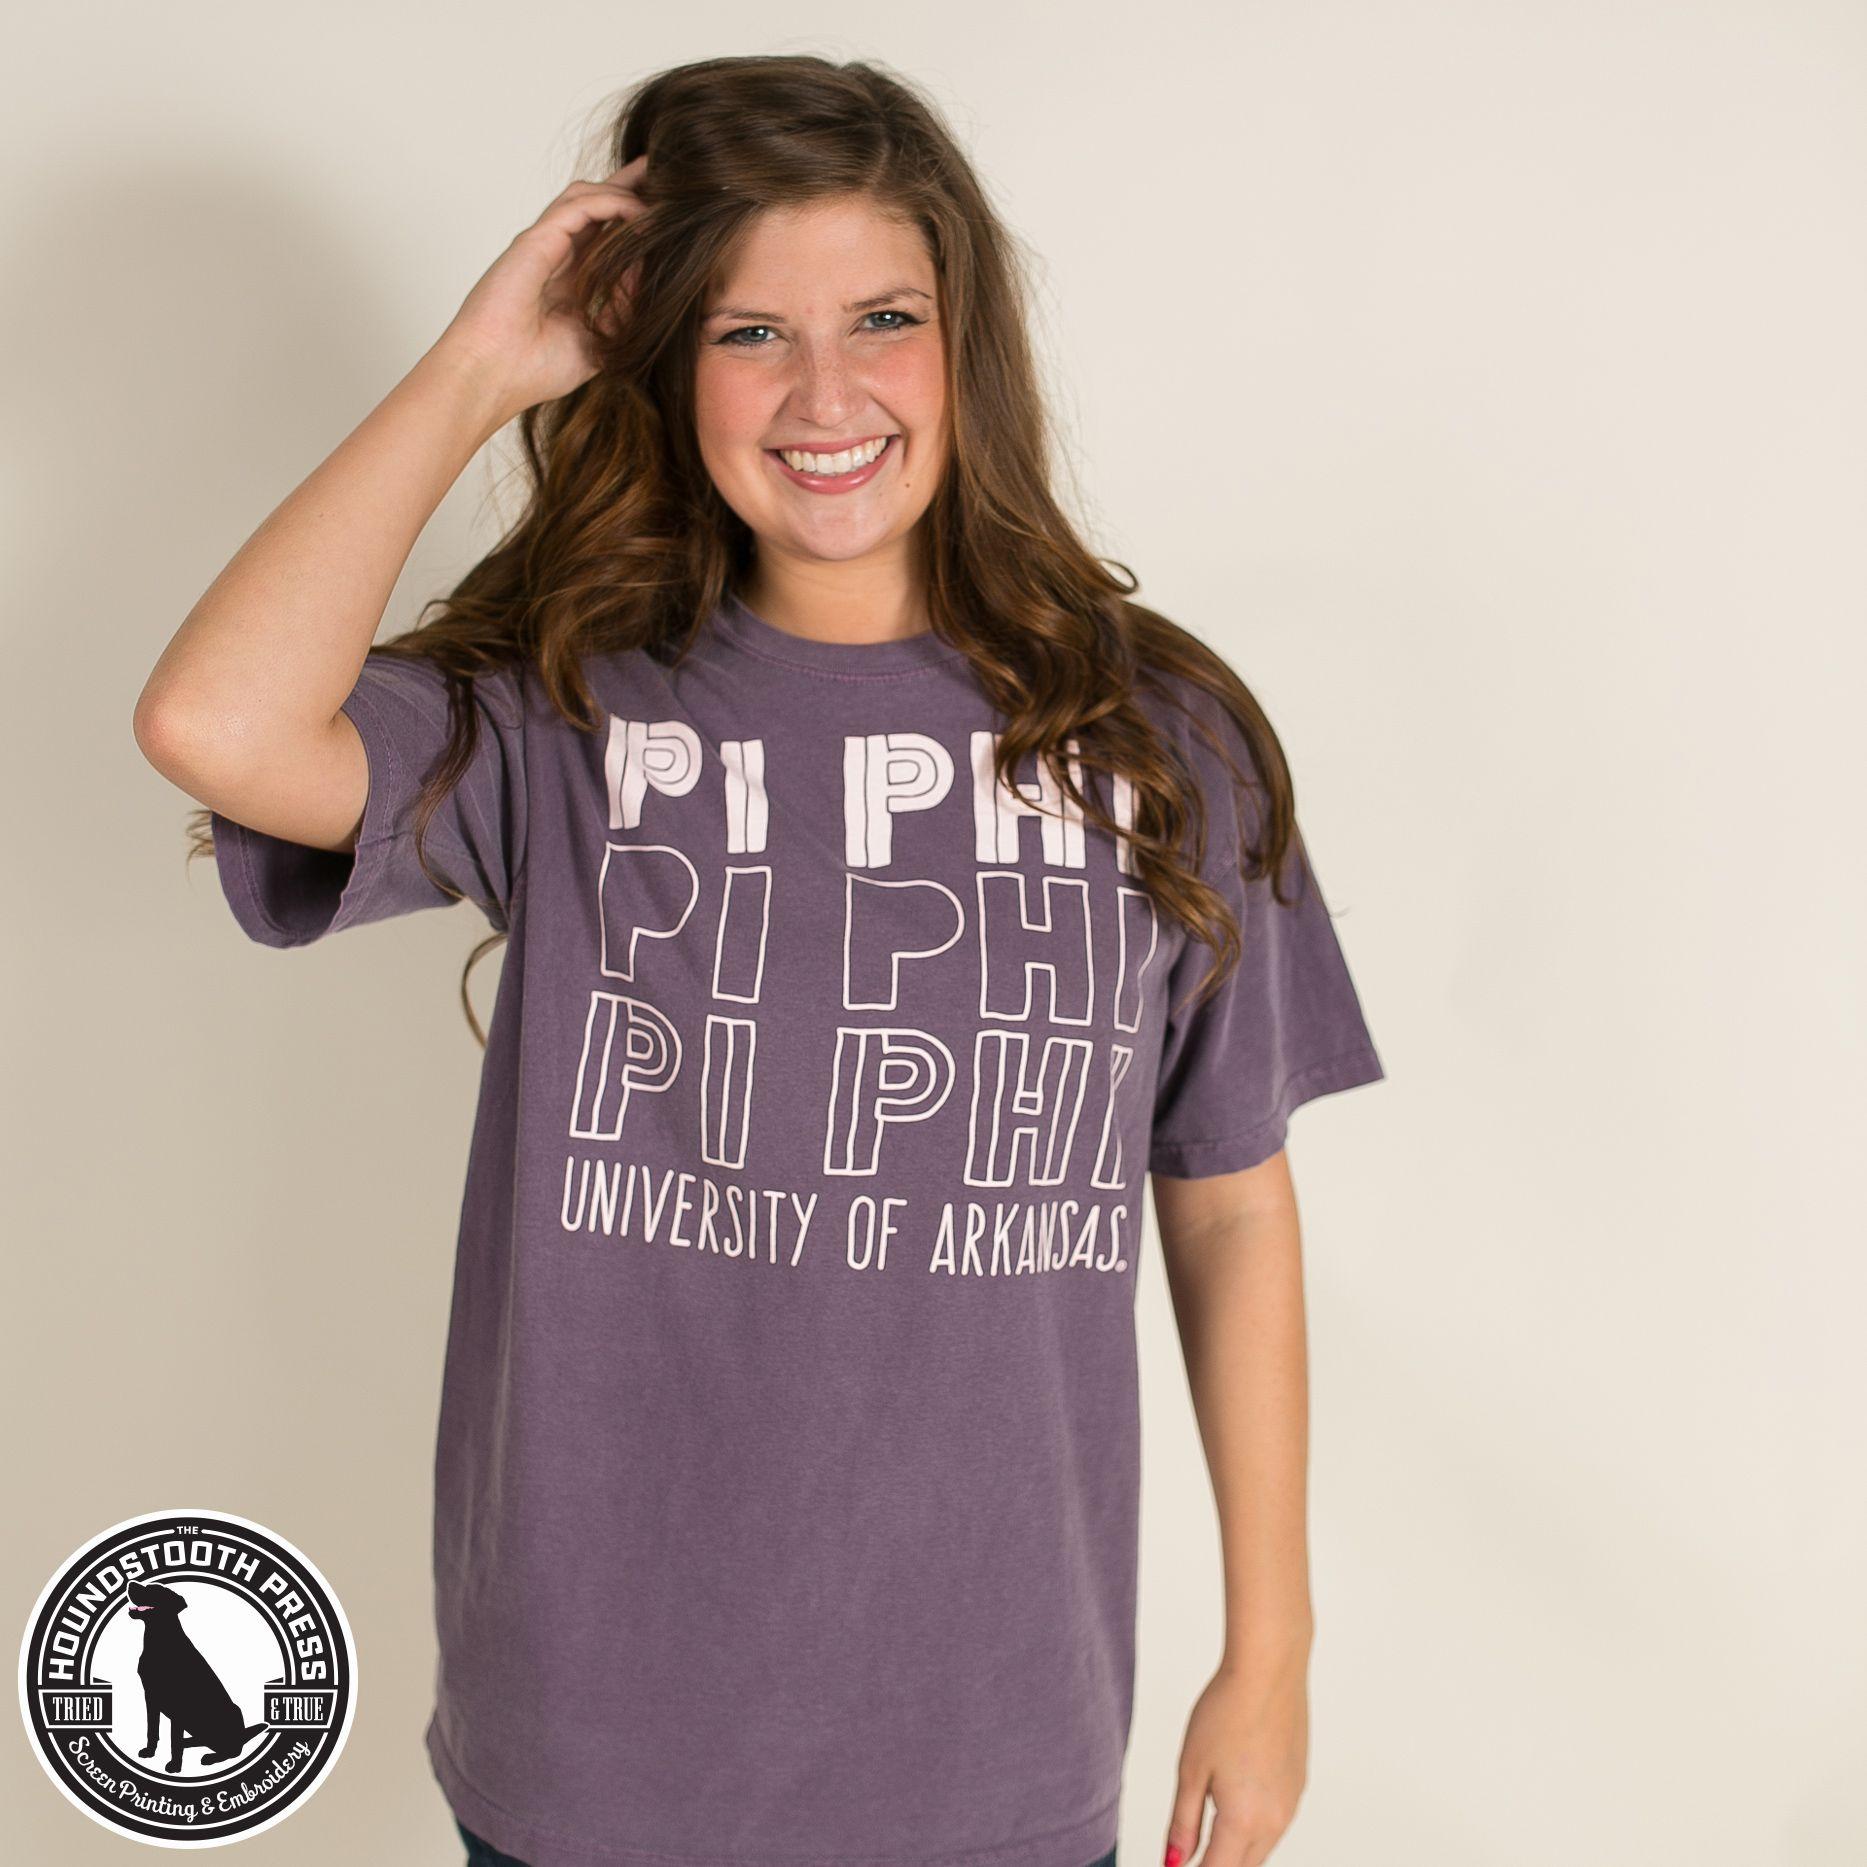 University Of Arkansas Pi Beta Phi Promotional T Shirt Comfort